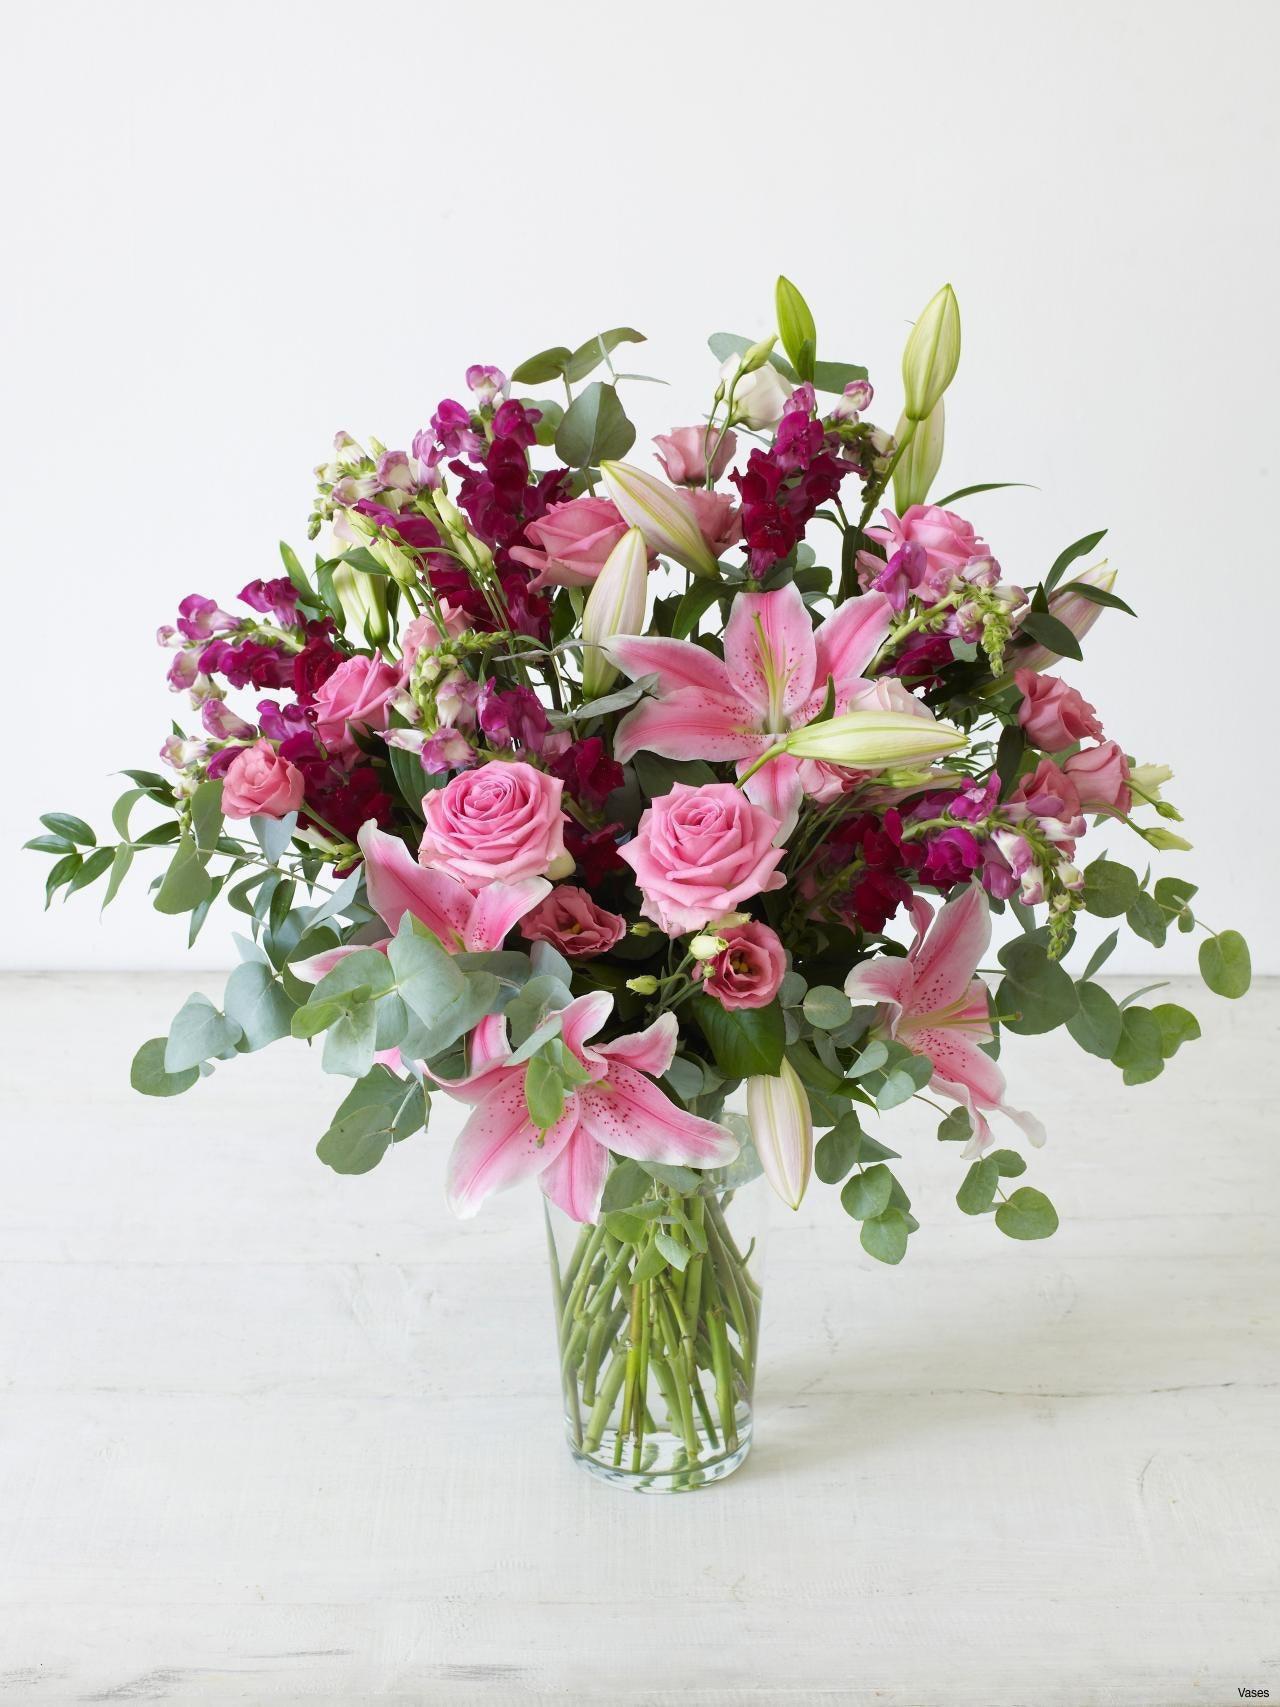 flower vase gems of beautiful decorative floral arrangements home obsesyjna com regarding beautiful decorative floral arrangements home